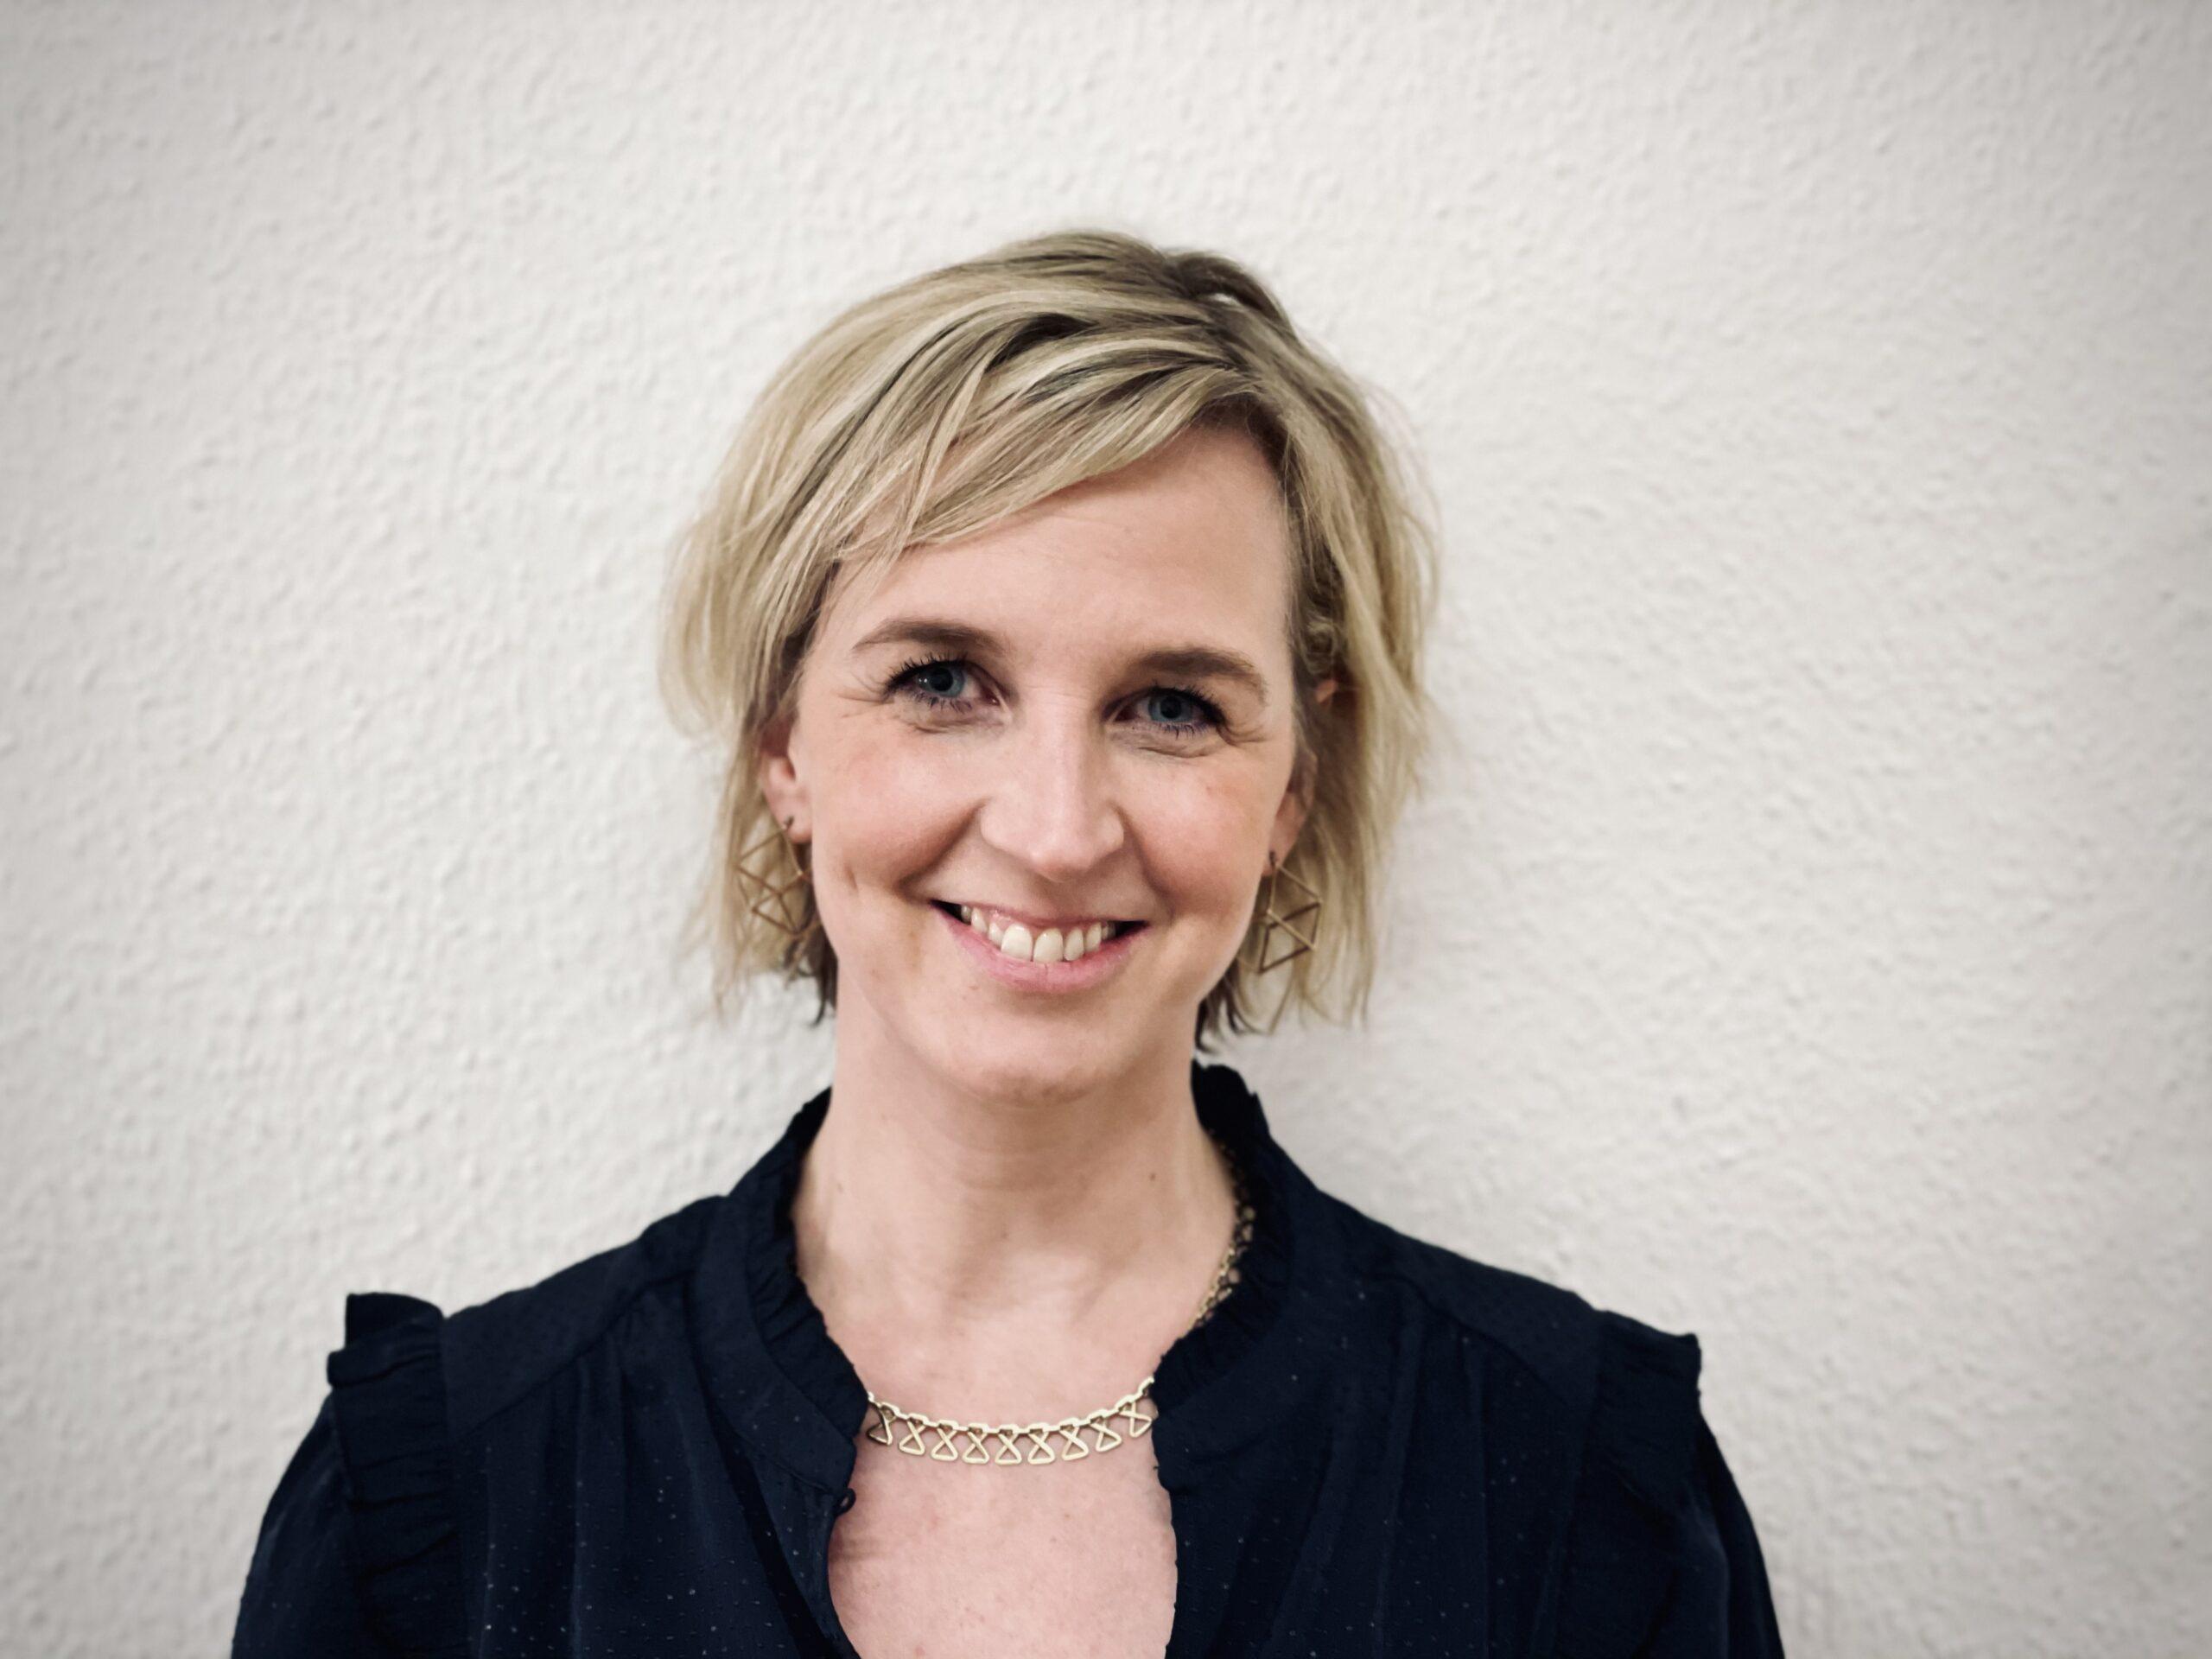 KDFB Anne Rauen